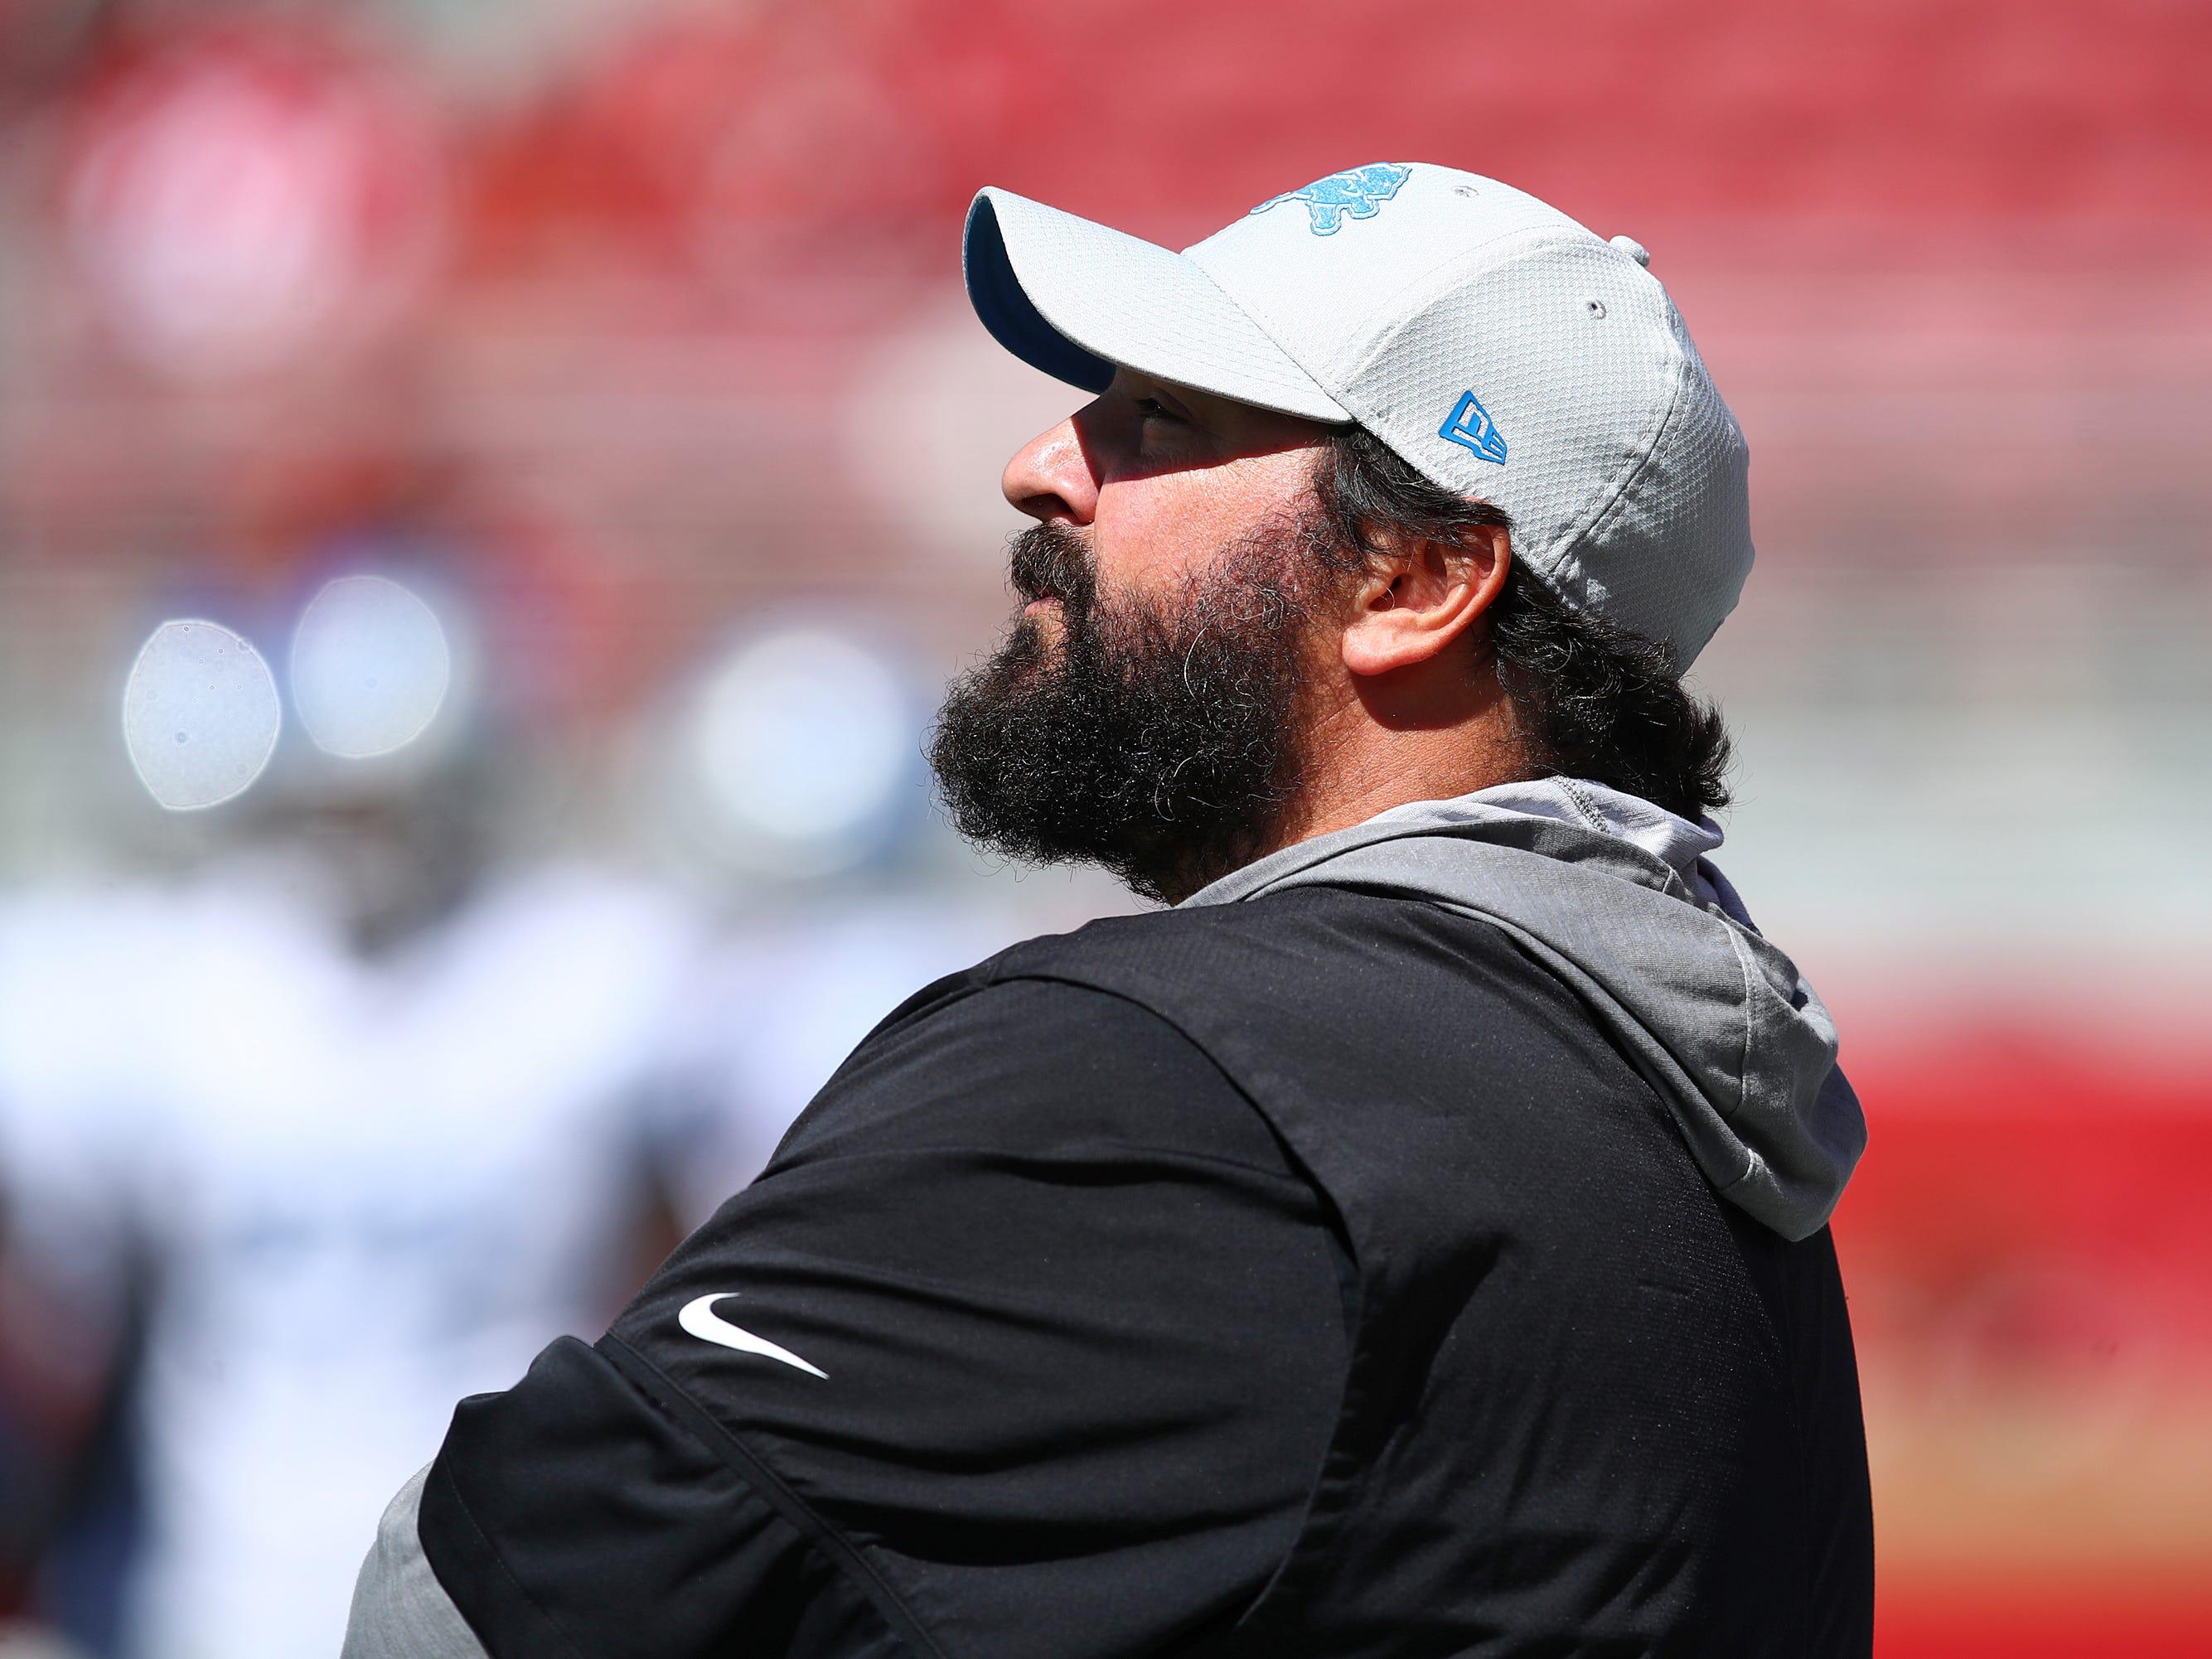 Detroit Lions head coach Matt Patricia watches warmups before an NFL football game against the San Francisco 49ers.